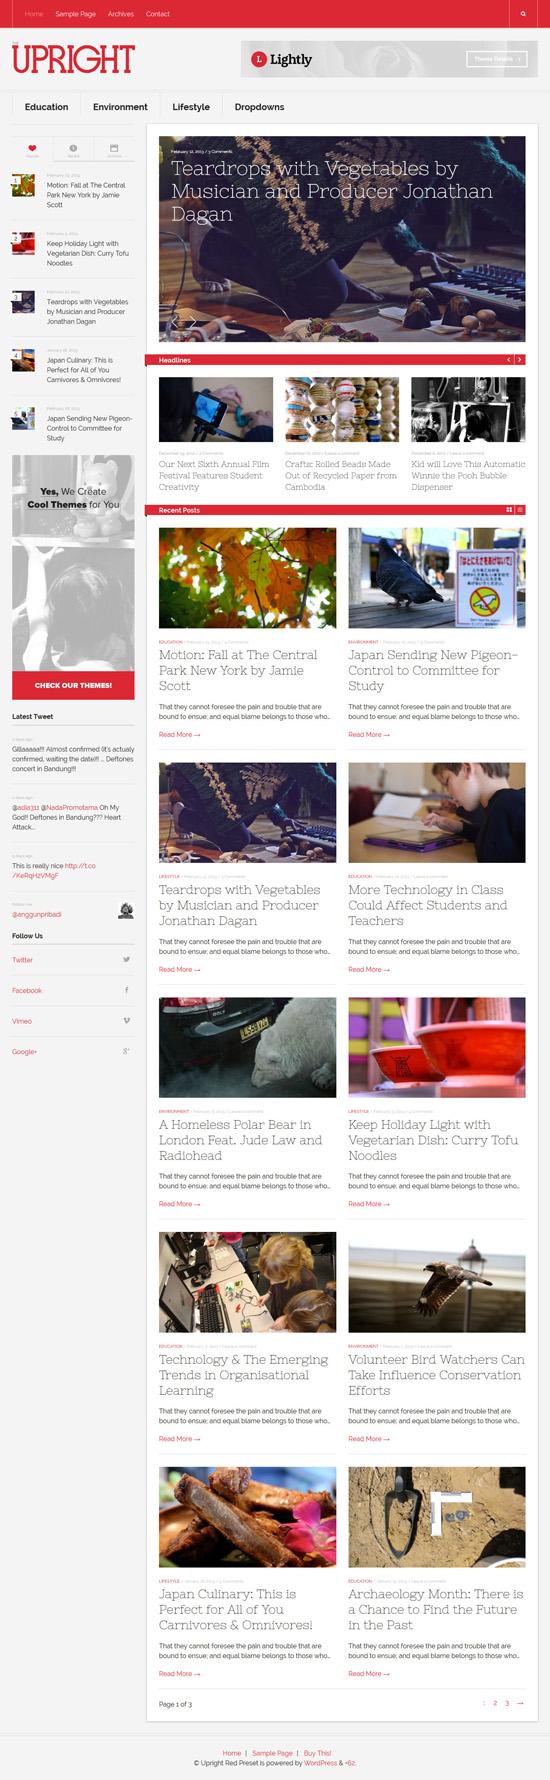 Upright - Magazine WordPress Theme